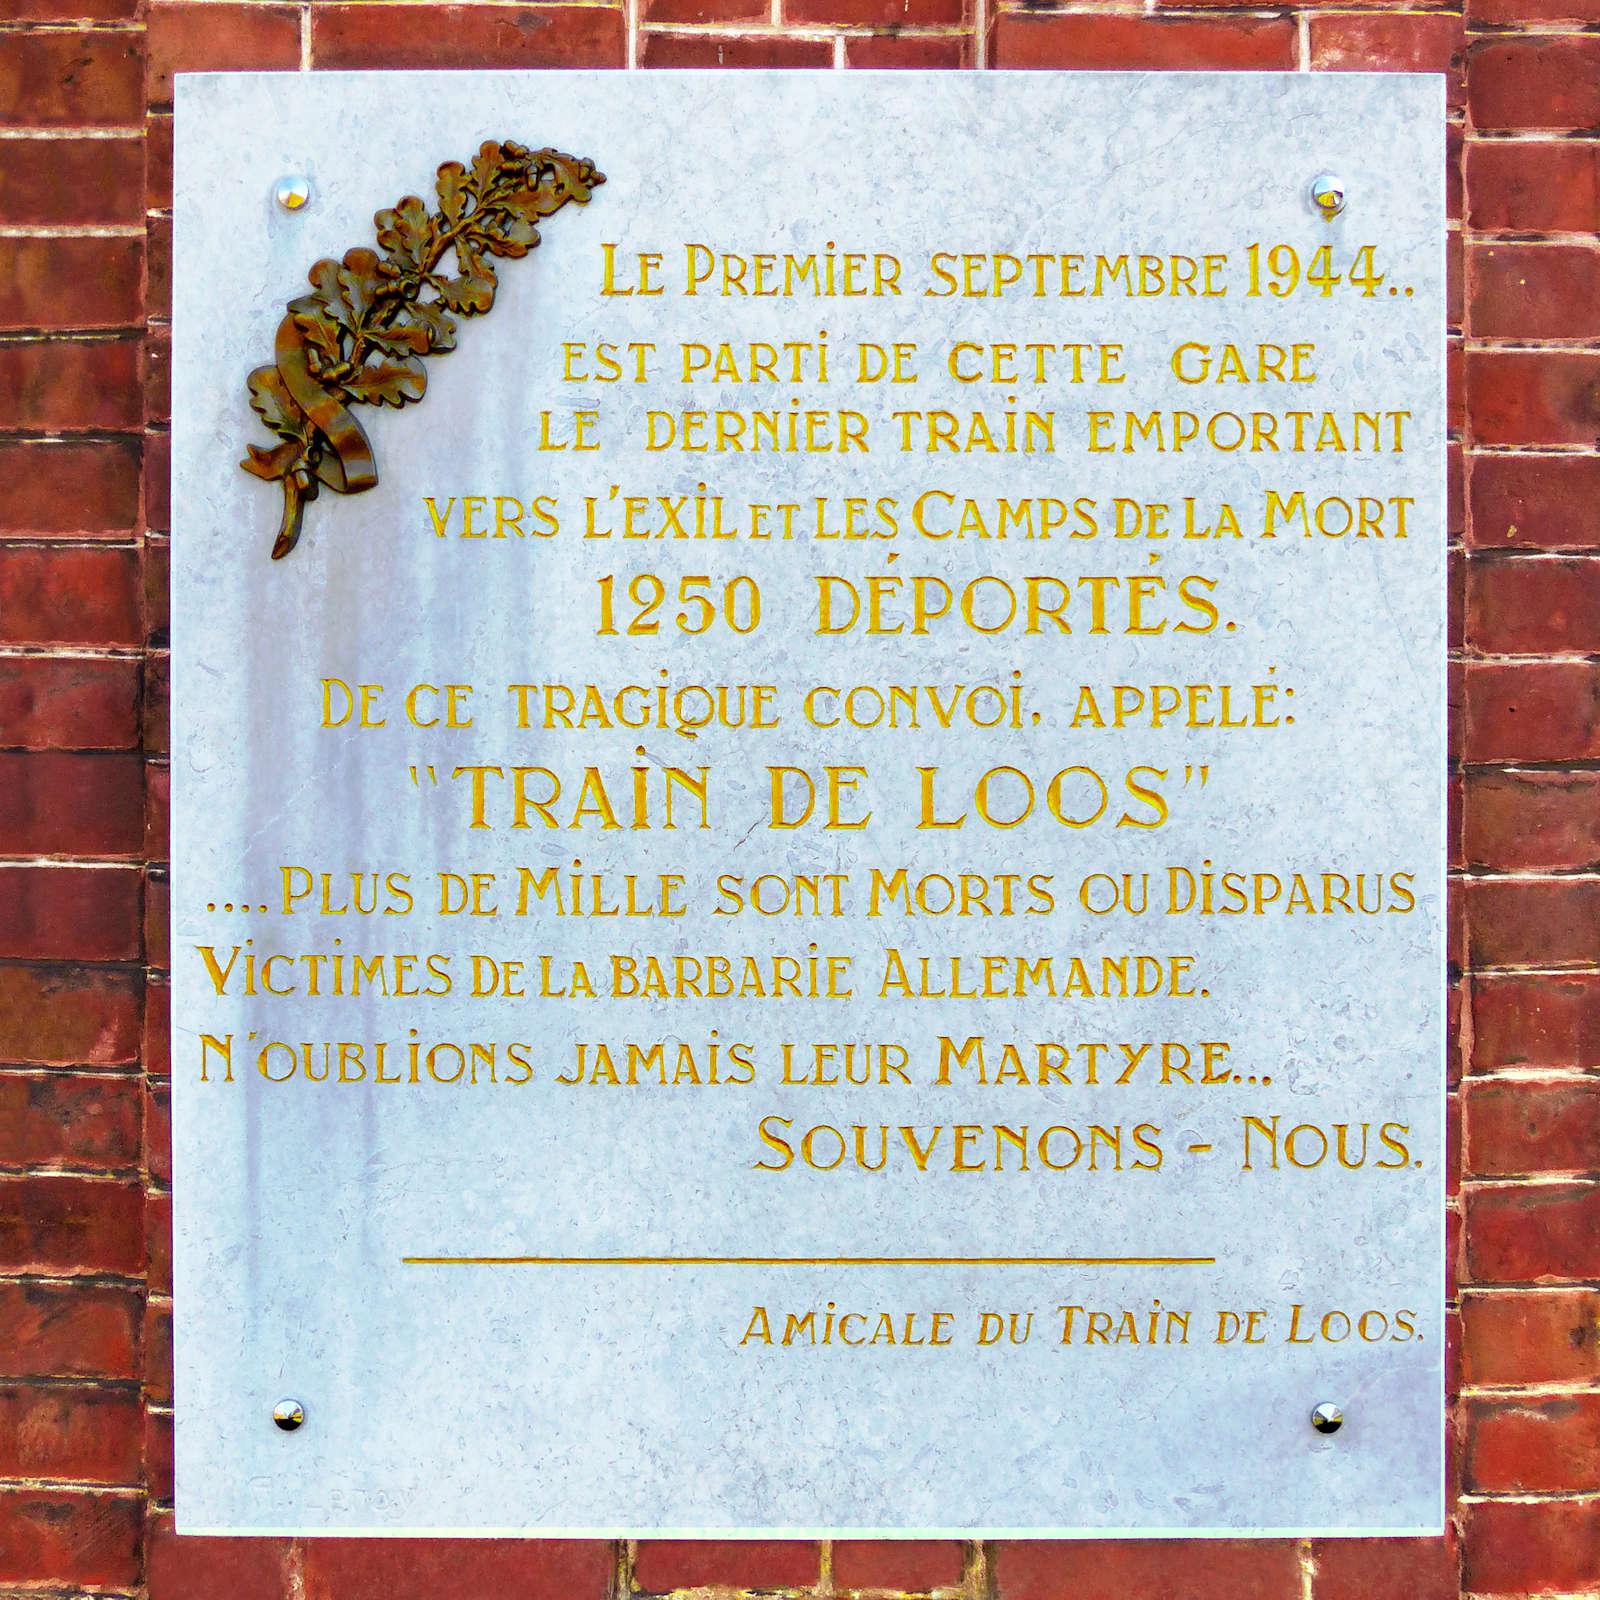 La plaque commémorative du Train de Loos